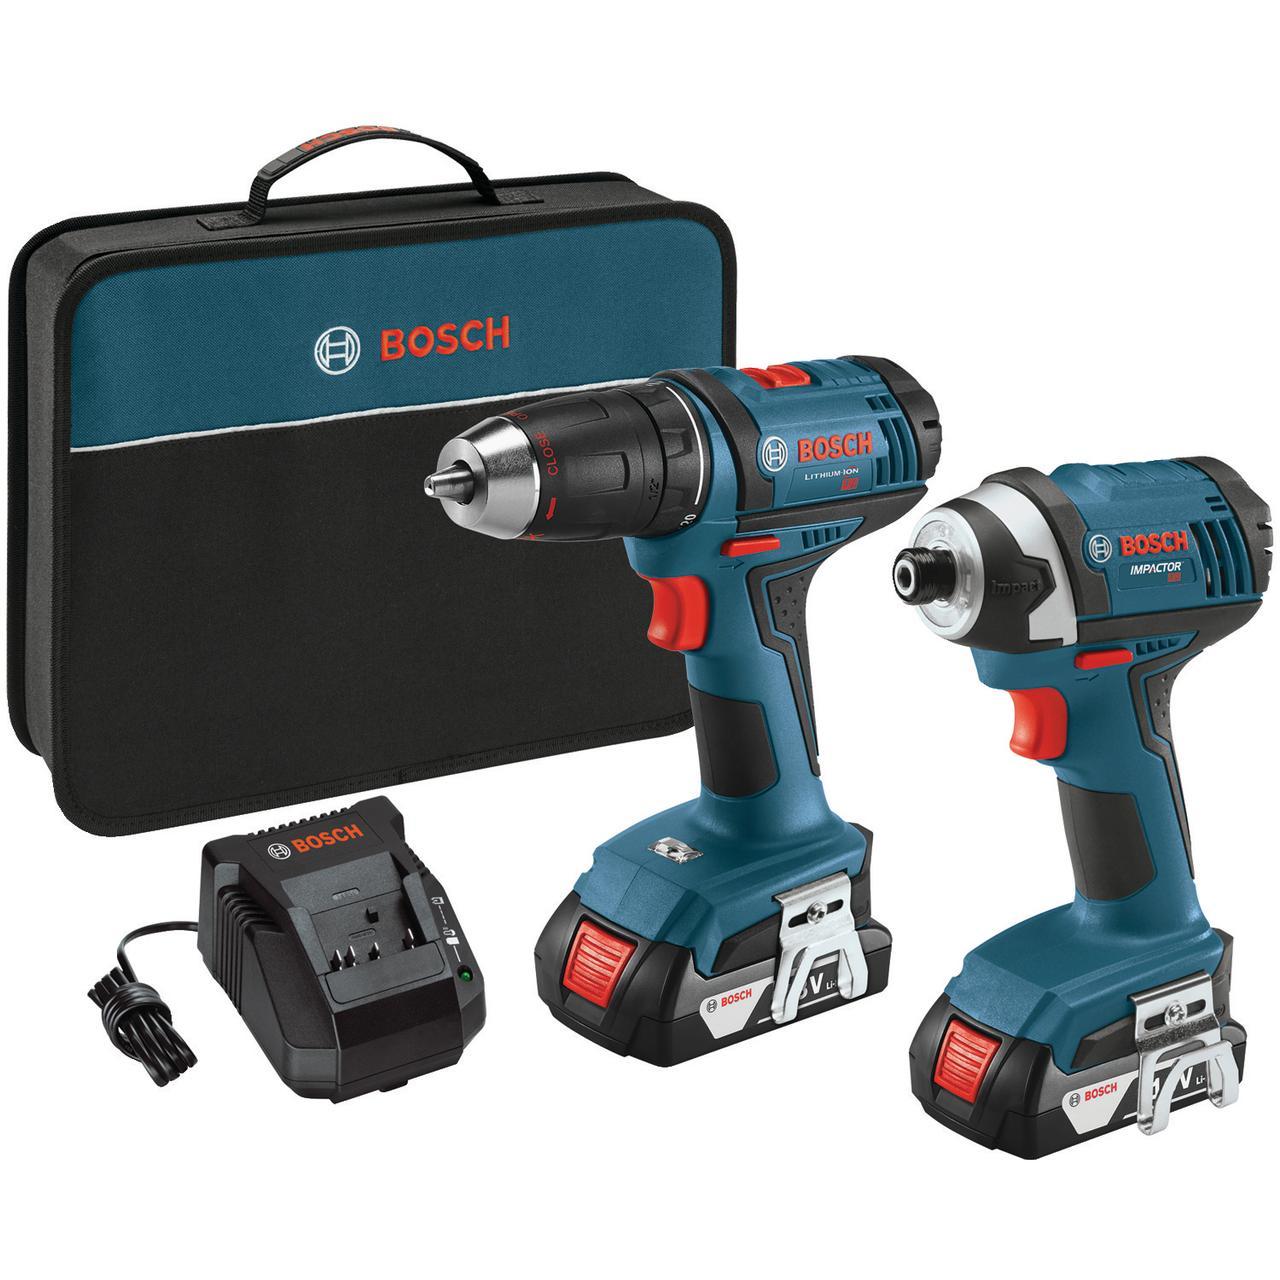 "Bosch CLPK26-181 Compact 1/2"" Drill/Driver & 1/4"" Hex Impact Driver 18-Volt Cordless Combo Kit"